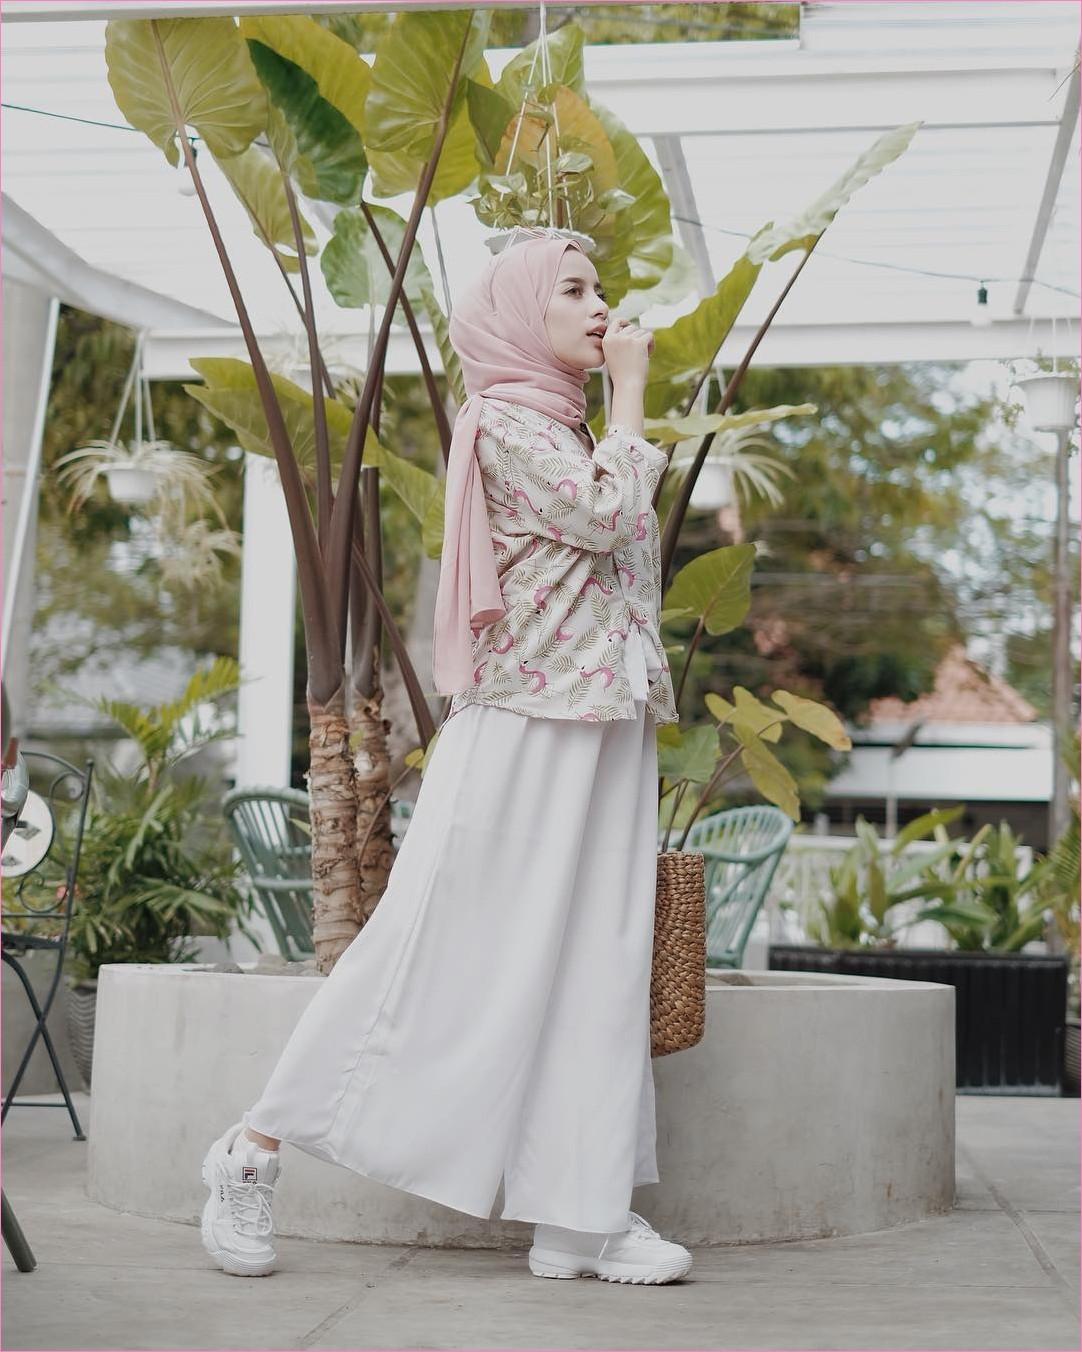 Outfit Kerudung Pashmina Ala Selebgram 2018 hijab pashmina sifon baby pink kemeja flamingo top blouse pink celana pallazo kulot krem muda kets snekers putih ootd trendy kekinian hijabers kacamata totebags rotan taman